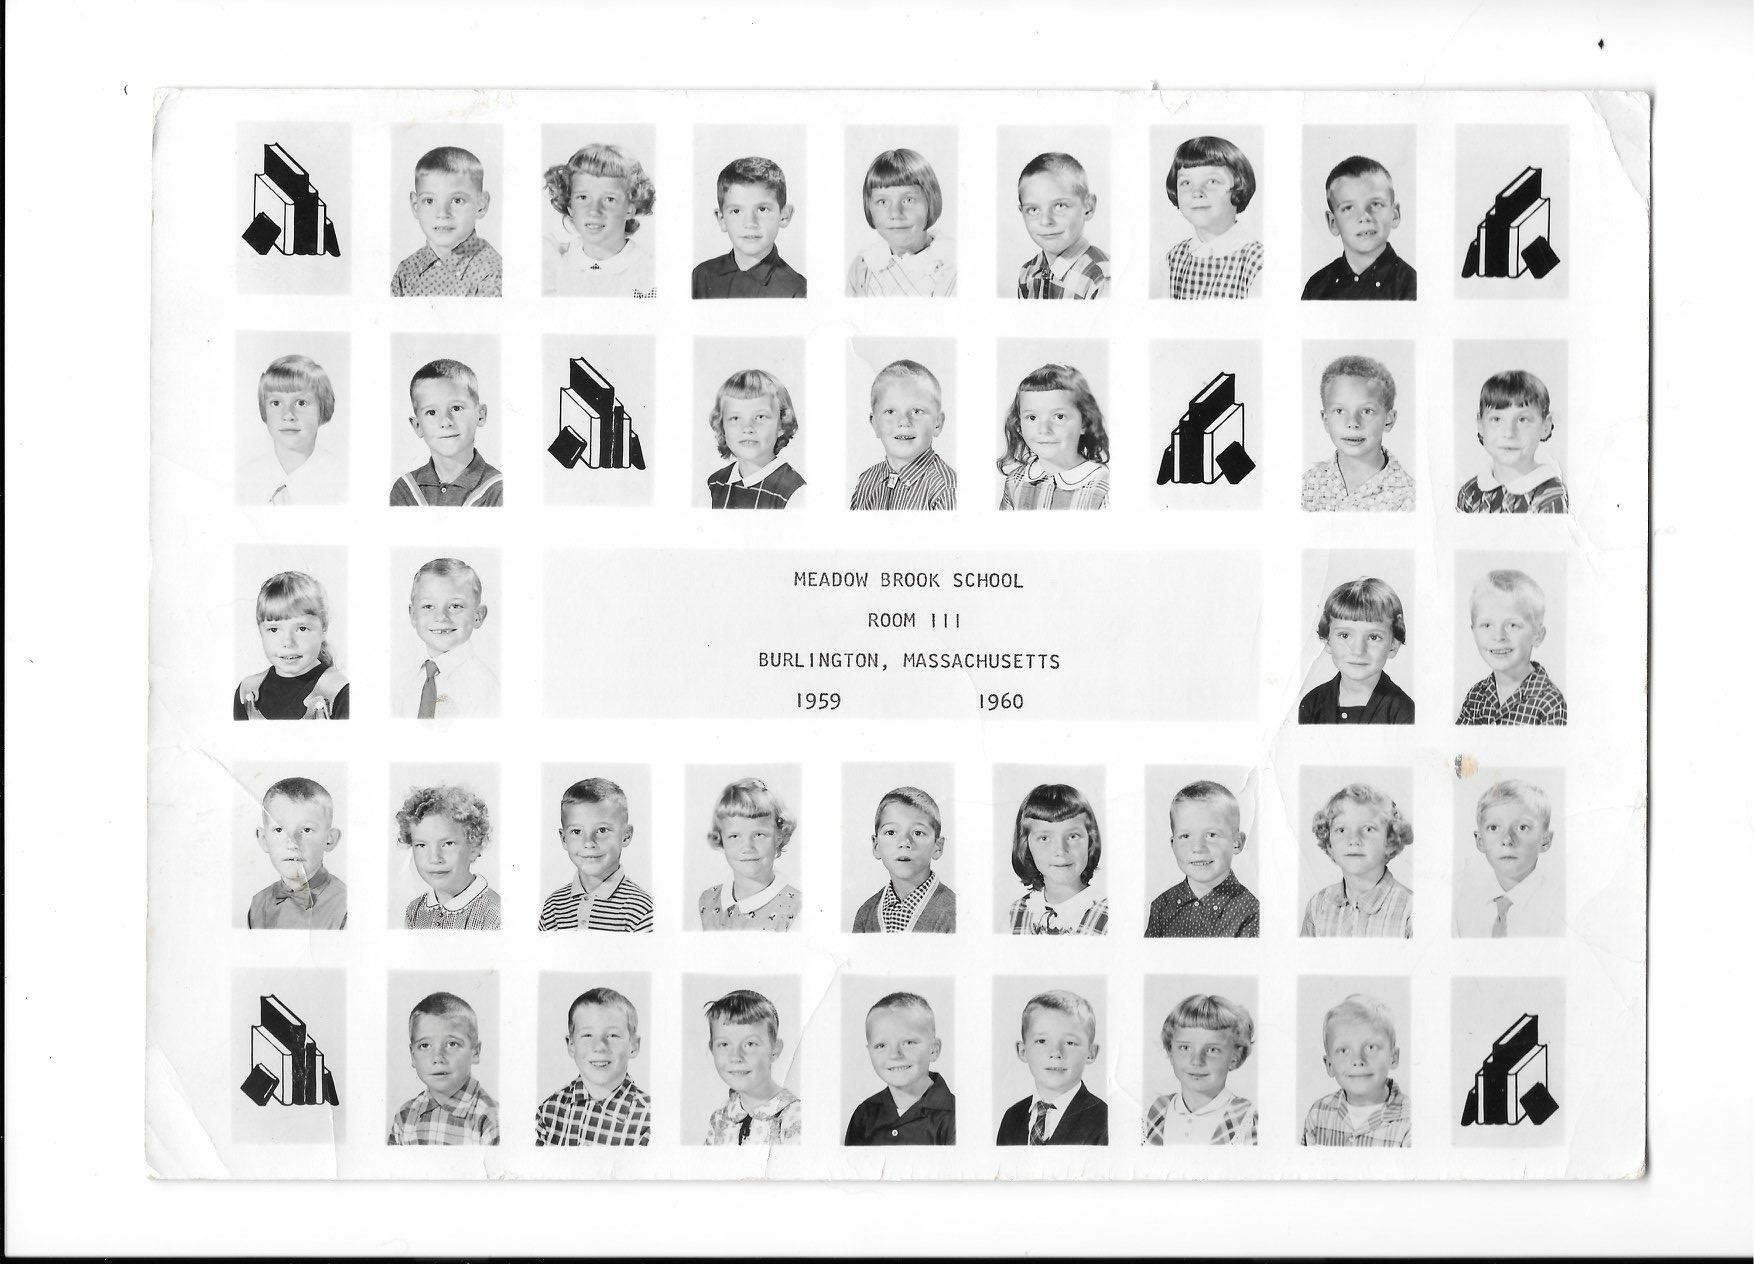 Meadow Brook School Room 111 1959 to 1960, Burlington MA